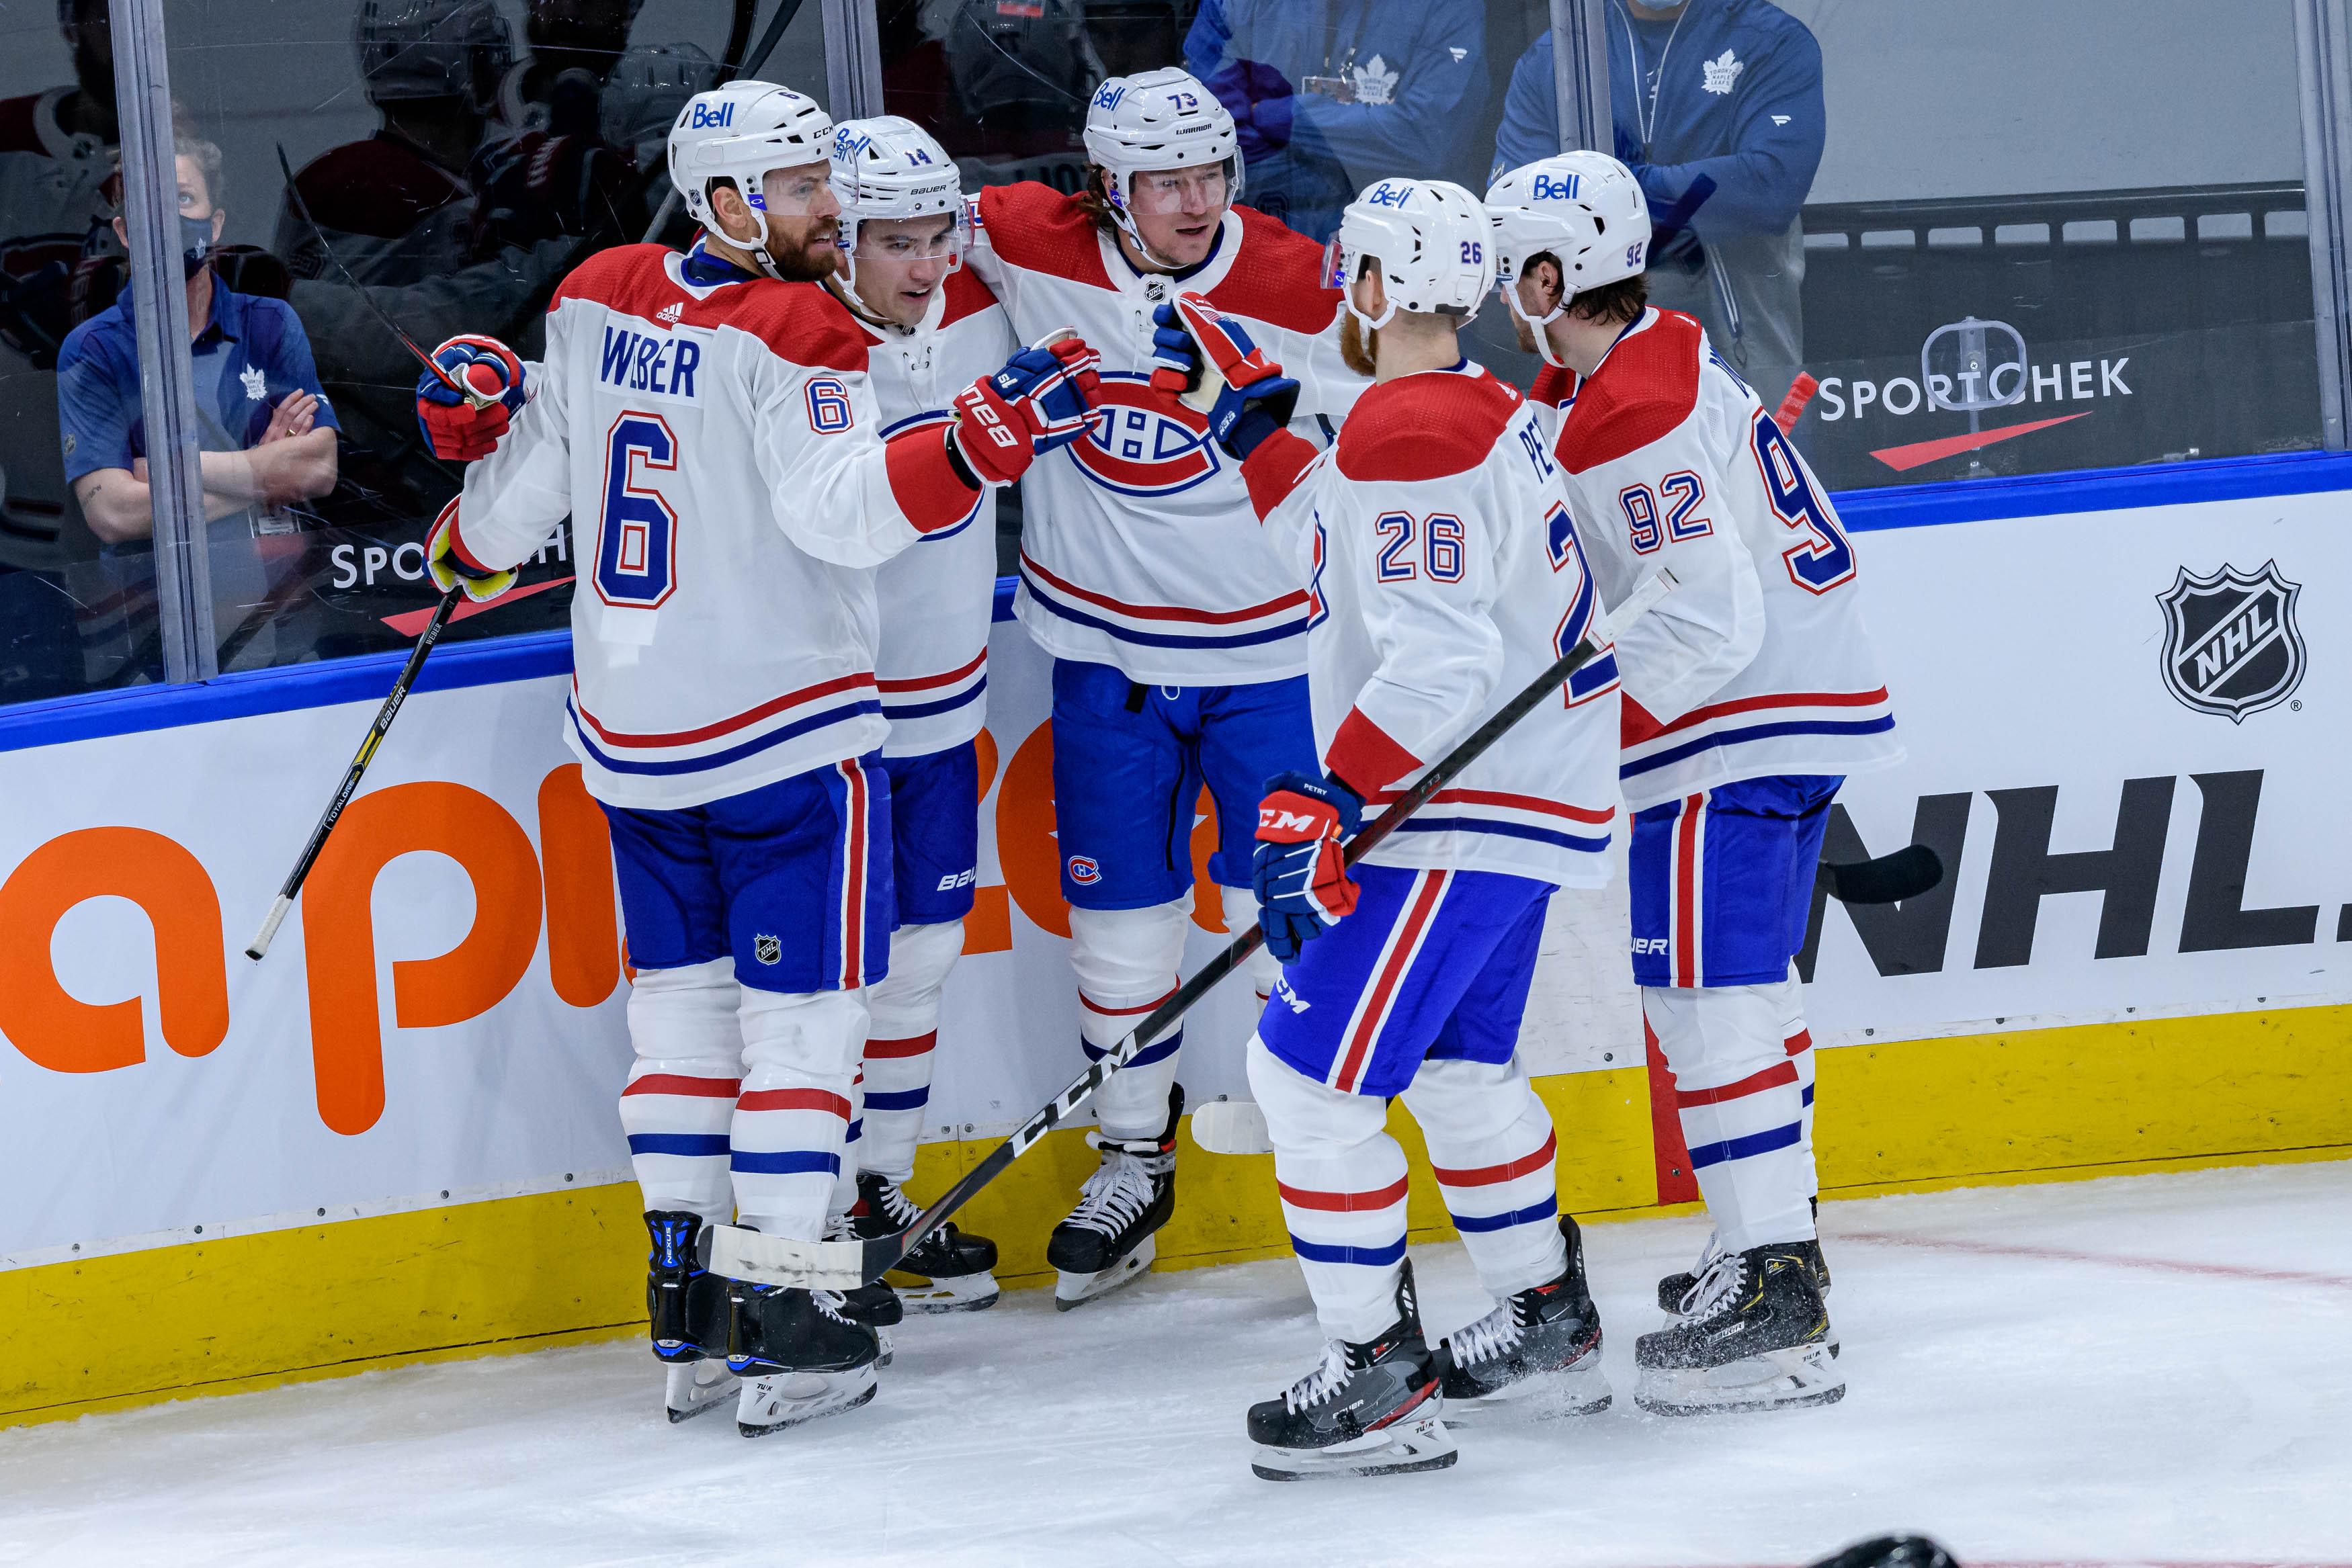 NHL: JAN 13 Canadiens at Maple Leafs